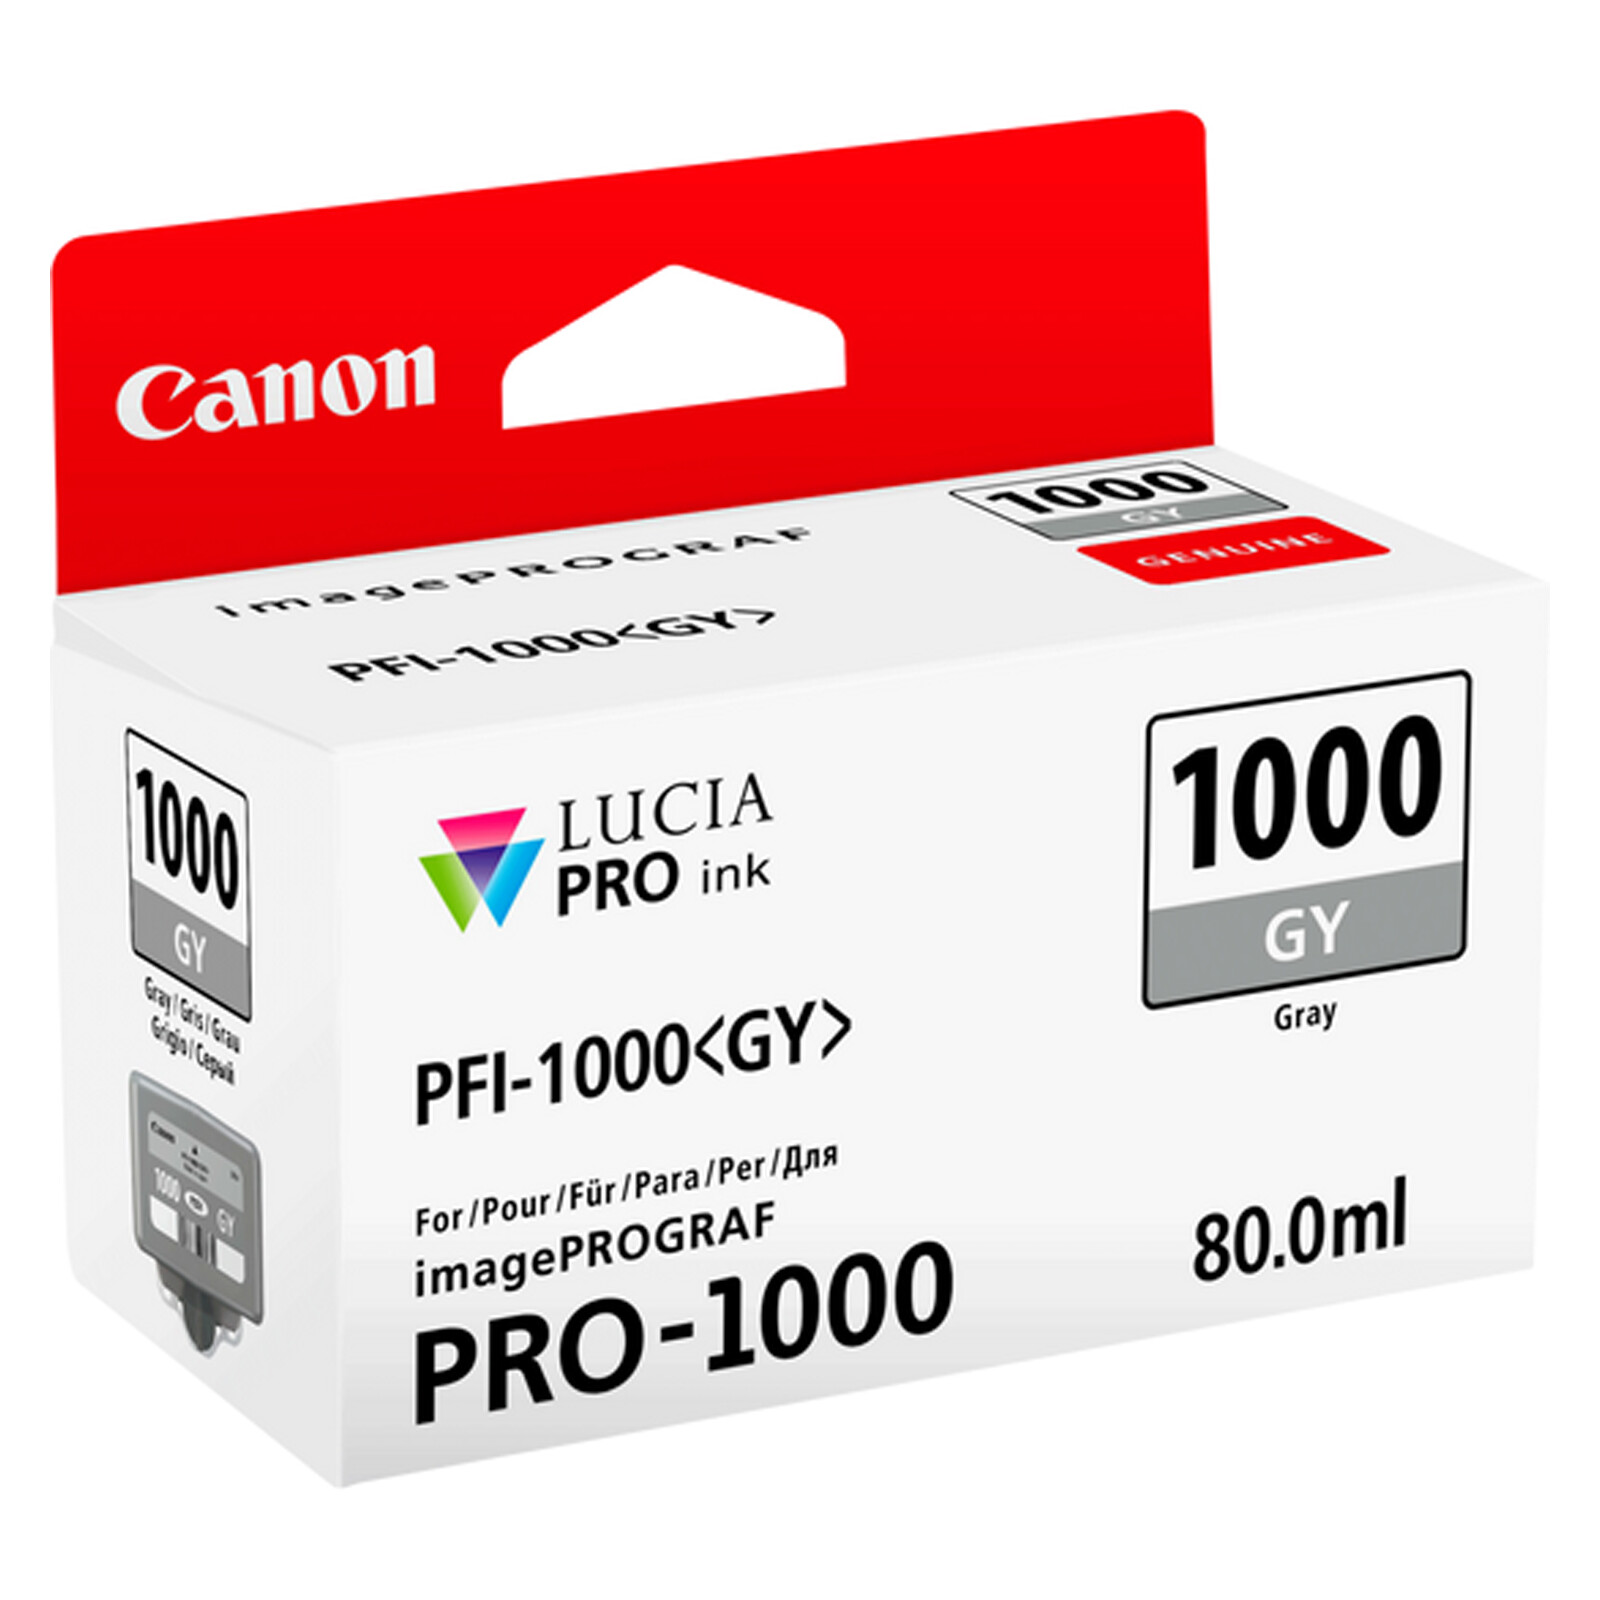 Canon PFI1000GY grey imagePrograf Pro 1000